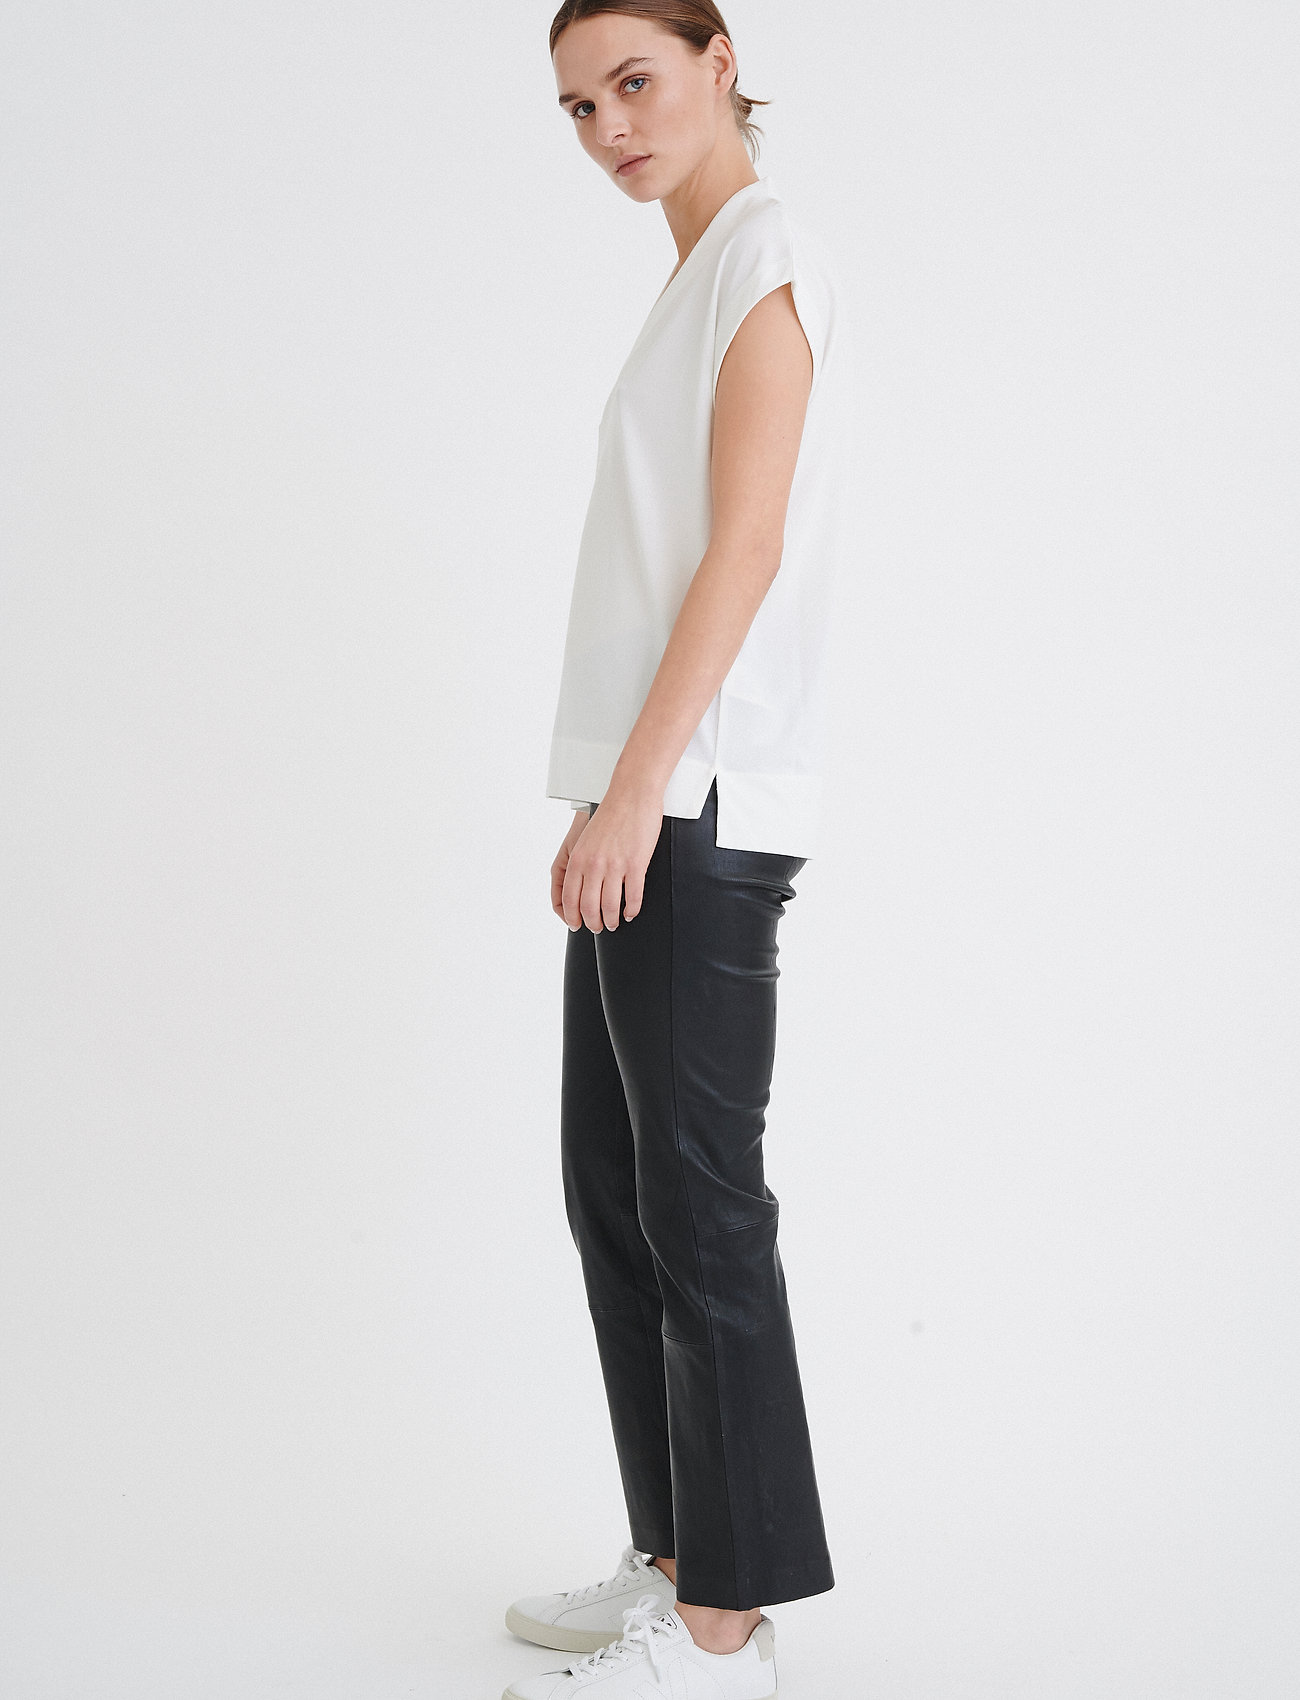 InWear Yamini Top - T-shirts & topper WHITE SMOKE - Dameklær Spesialtilbud